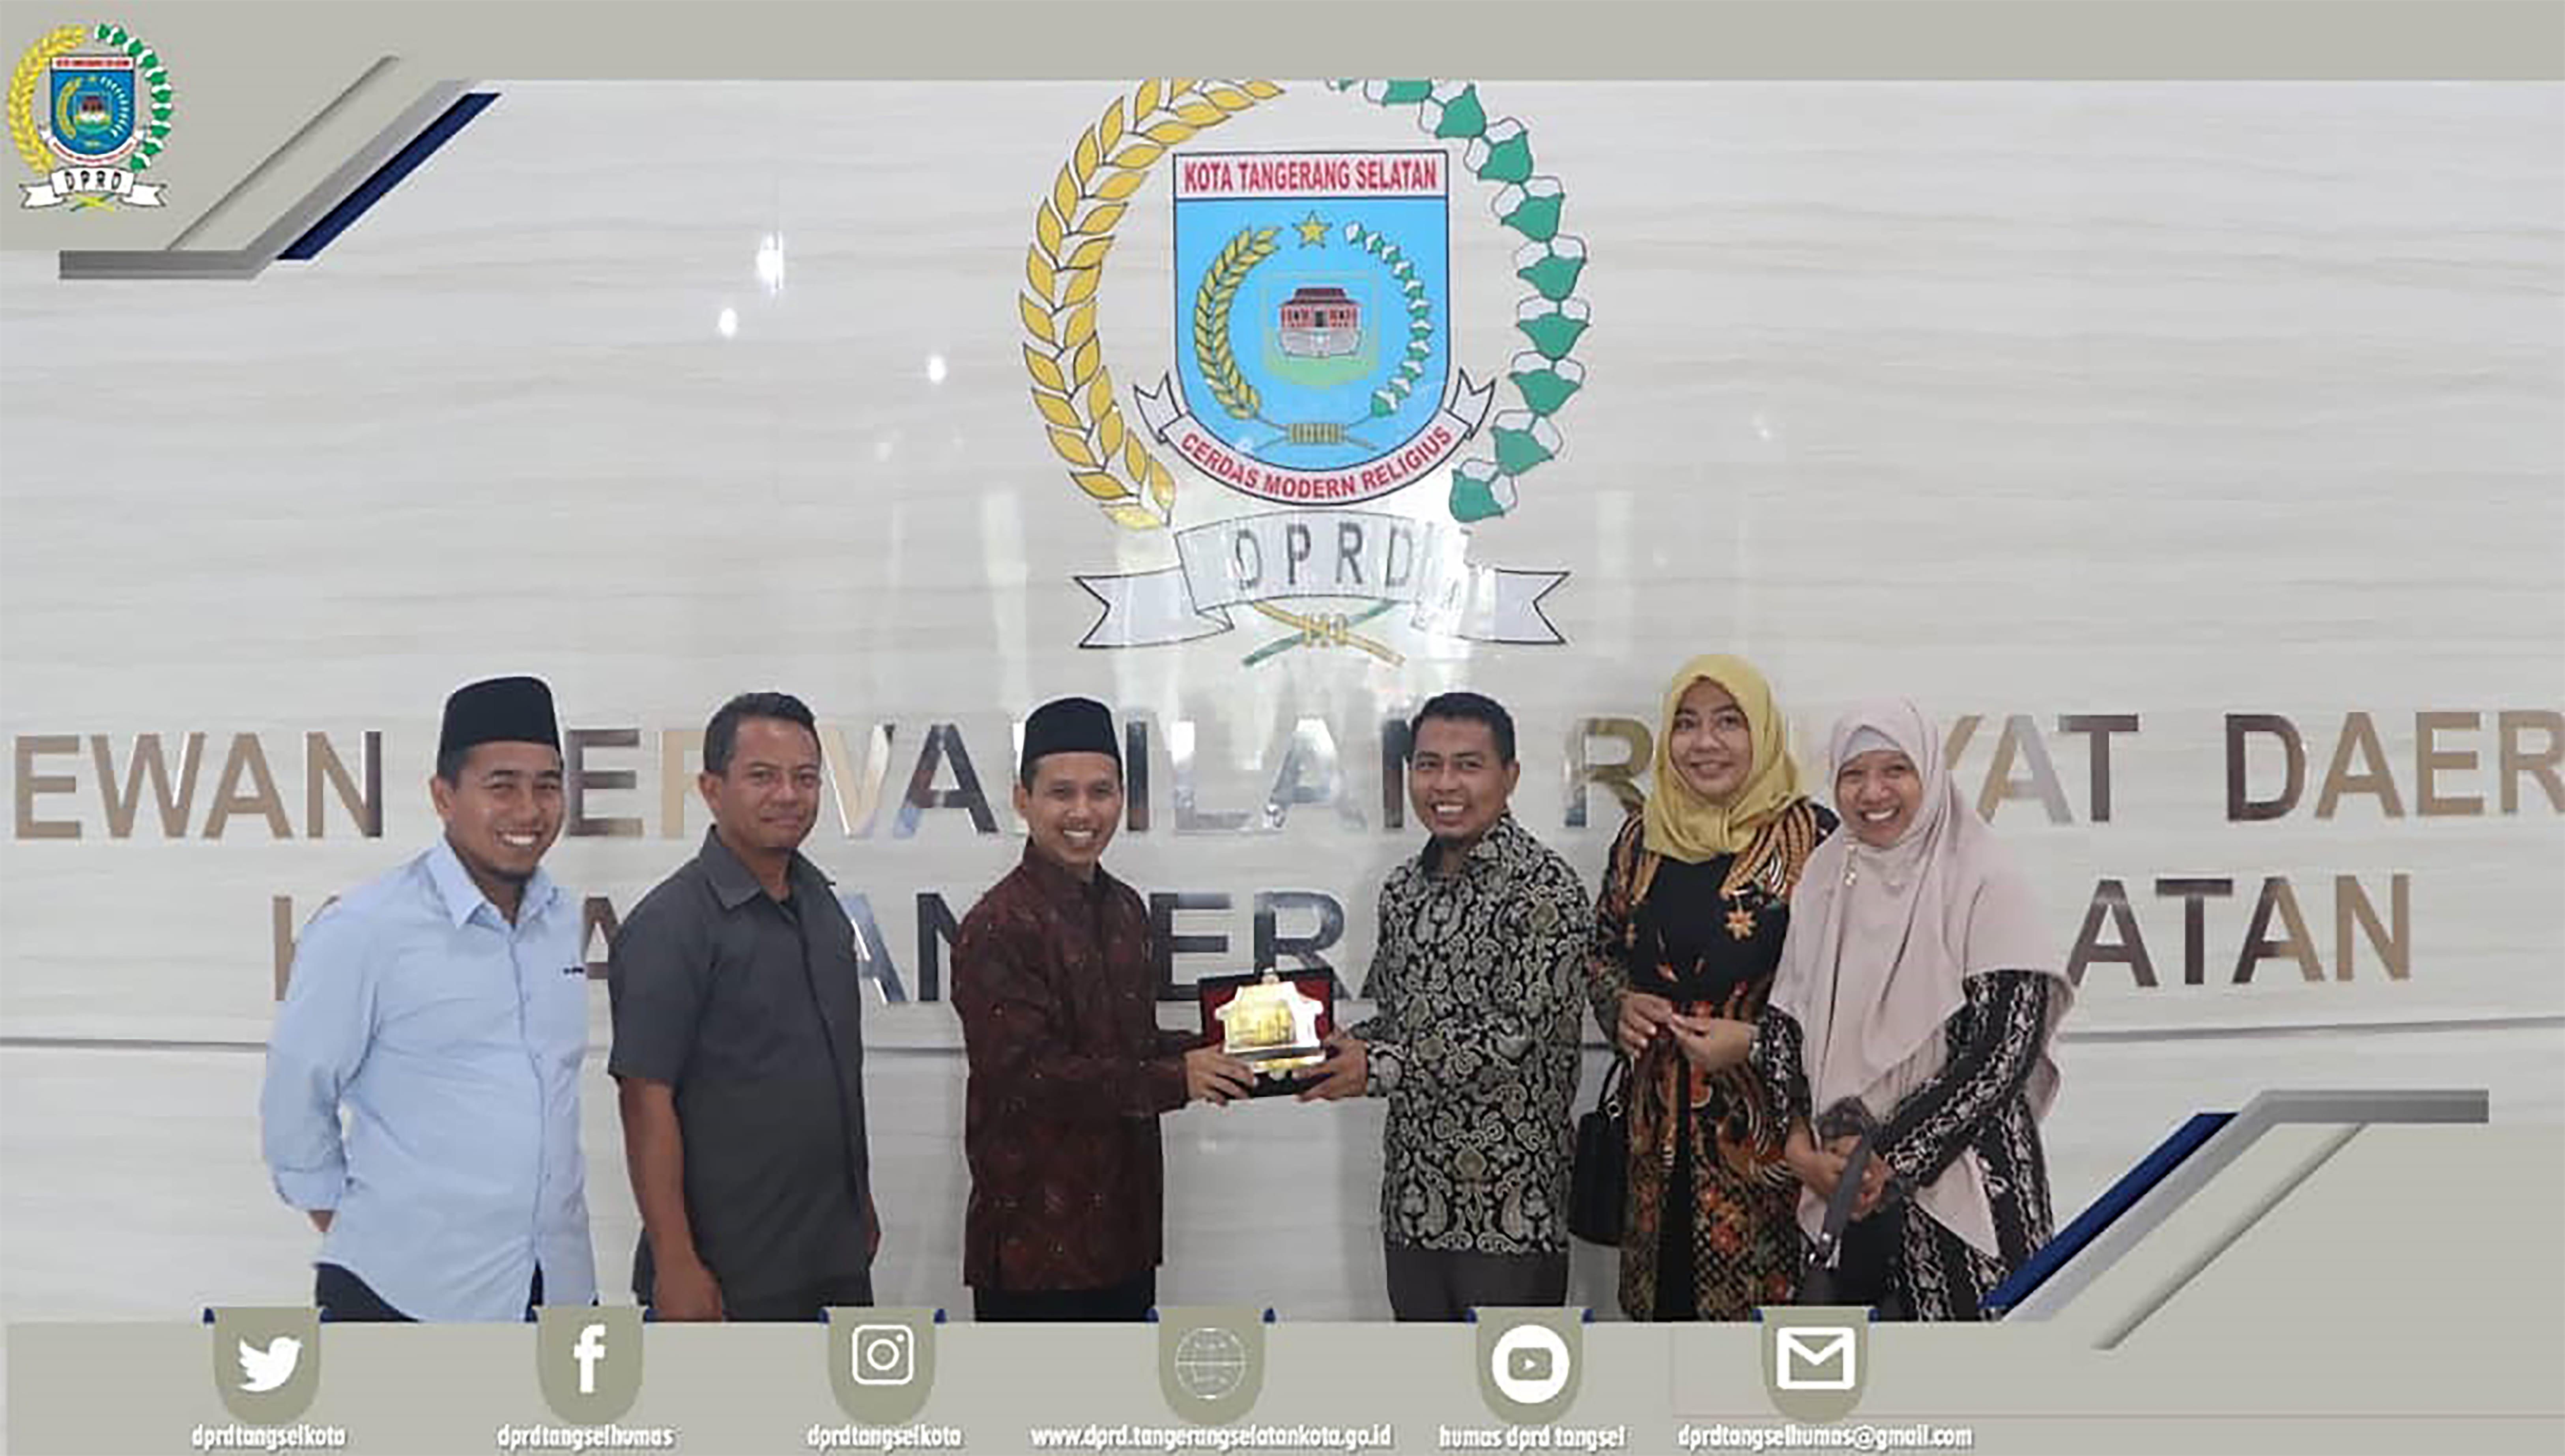 Wakil Ketua DPRD menerima Kunker dari DPRD Kabupaten Lombok Barat